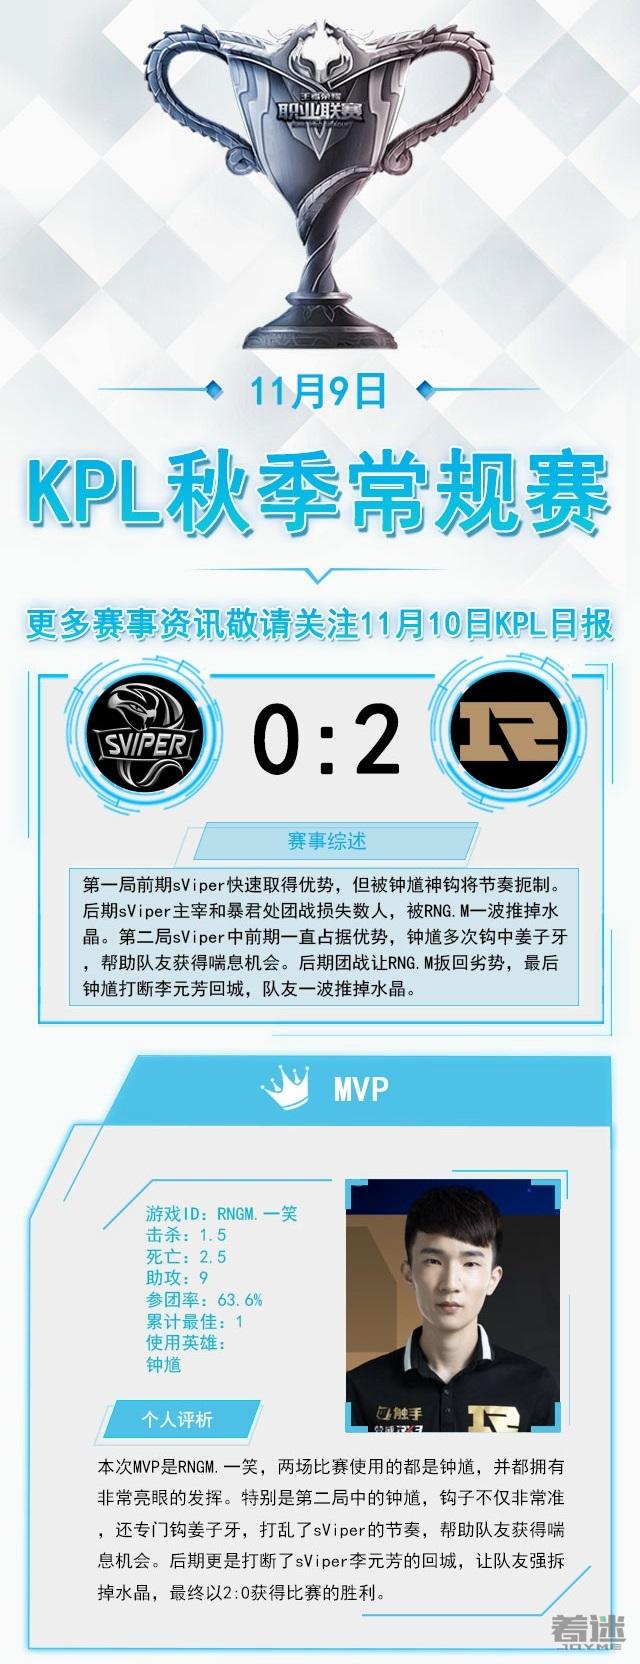 KPL最新战报:XQ击碎AS仙阁保级梦,RNG.M2:0再擒毒蛇